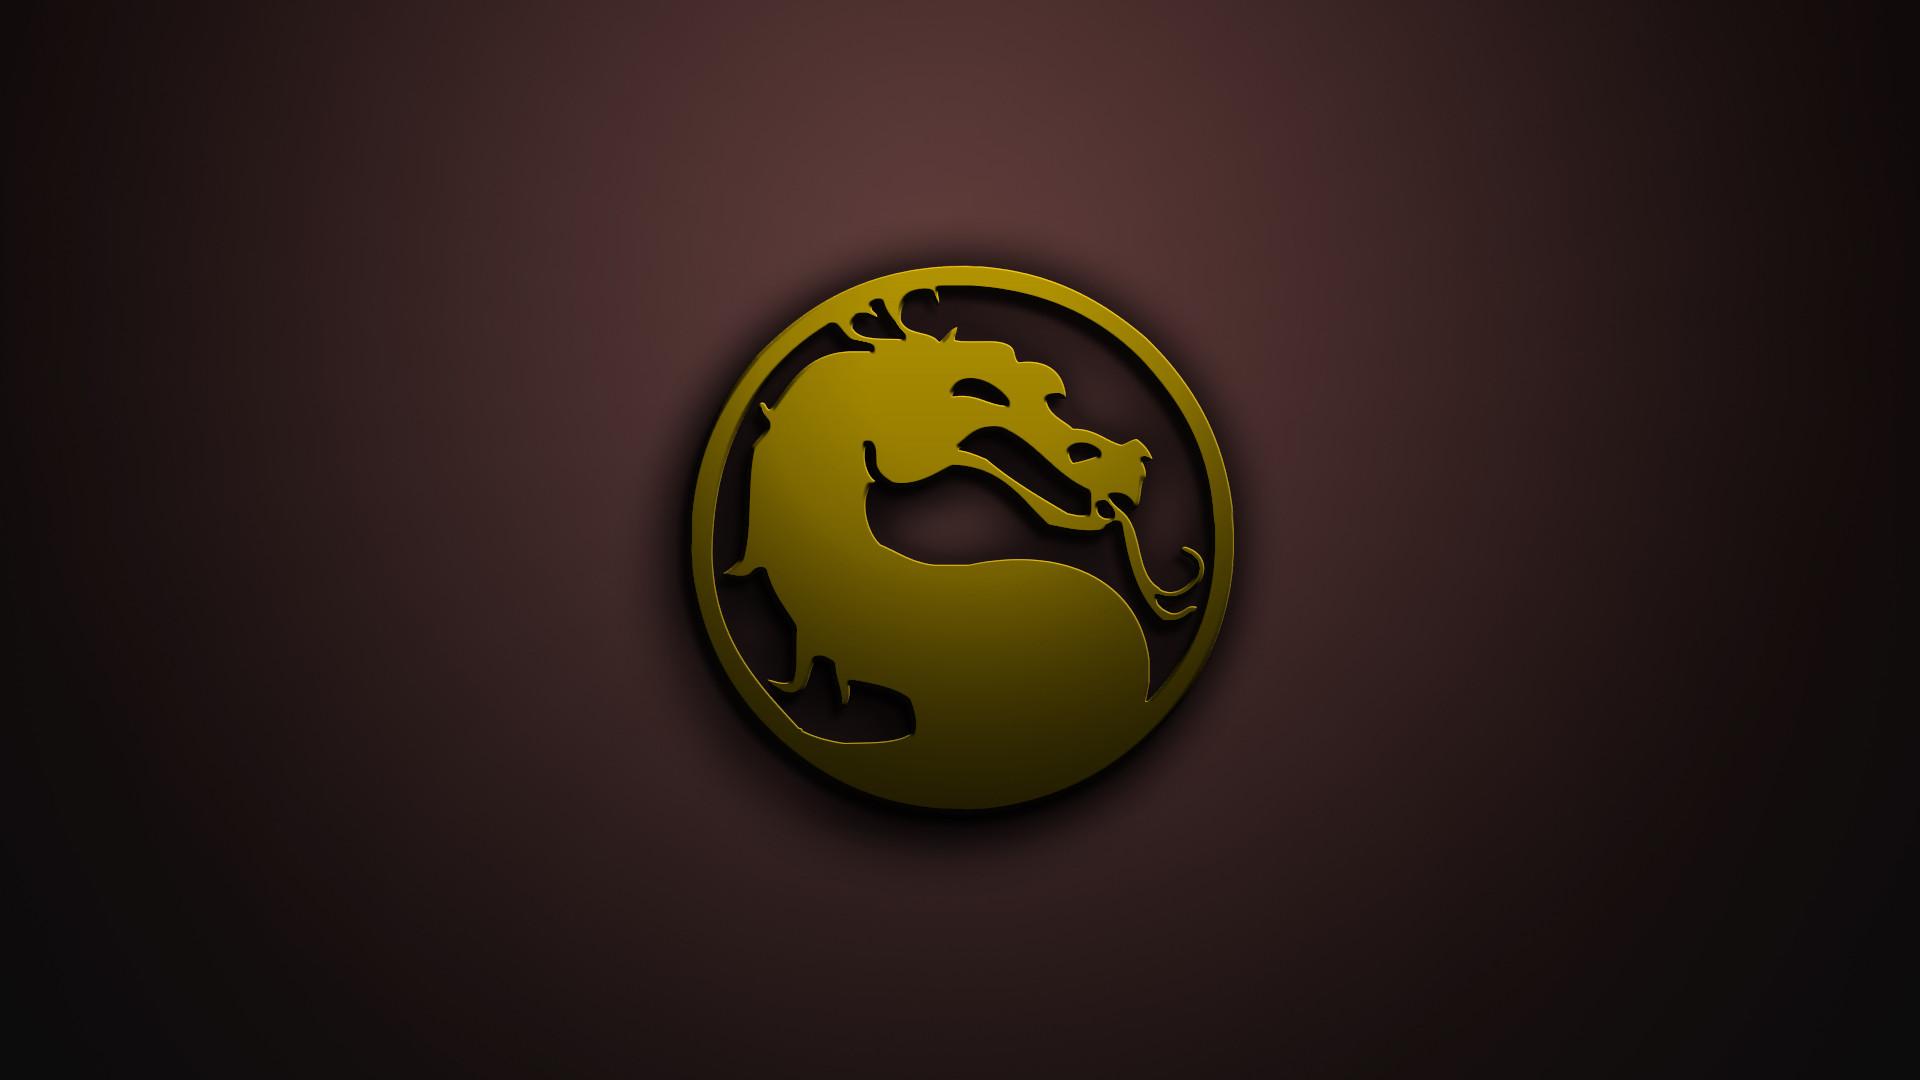 Free Download Mortal Kombat Logo 1920x1080 For Your Desktop